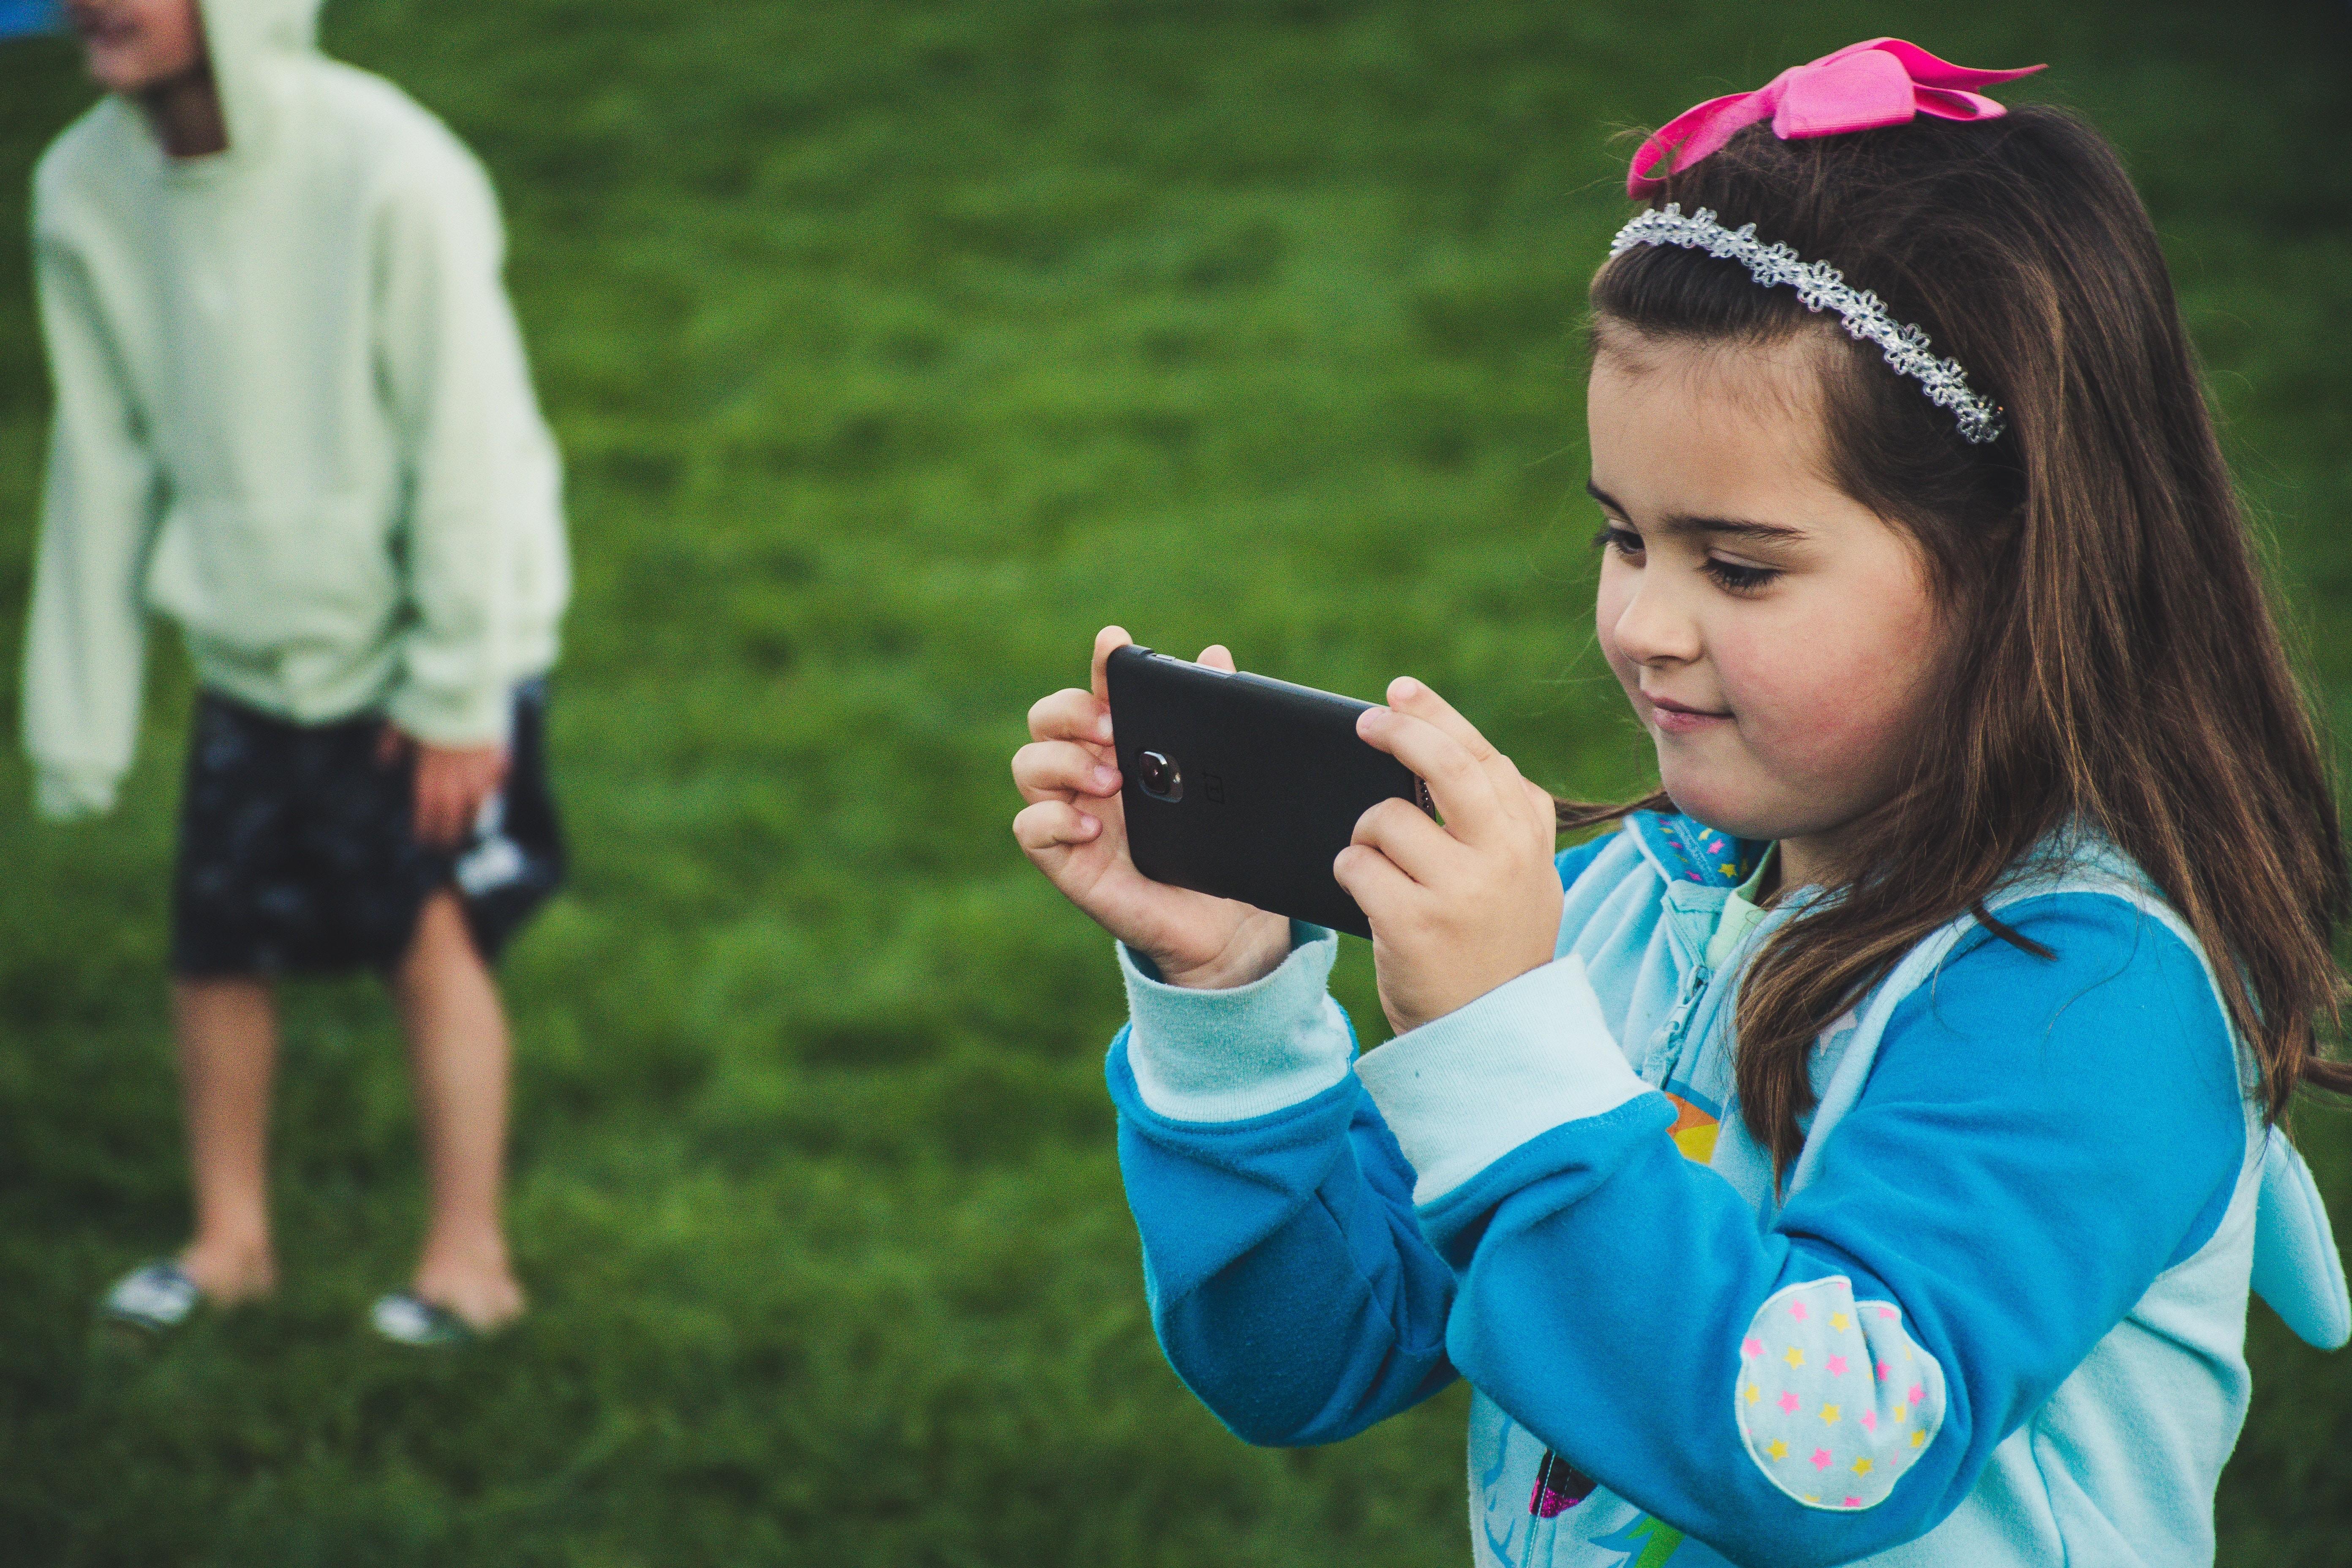 Смартфоны плохо влияют на развитие детей